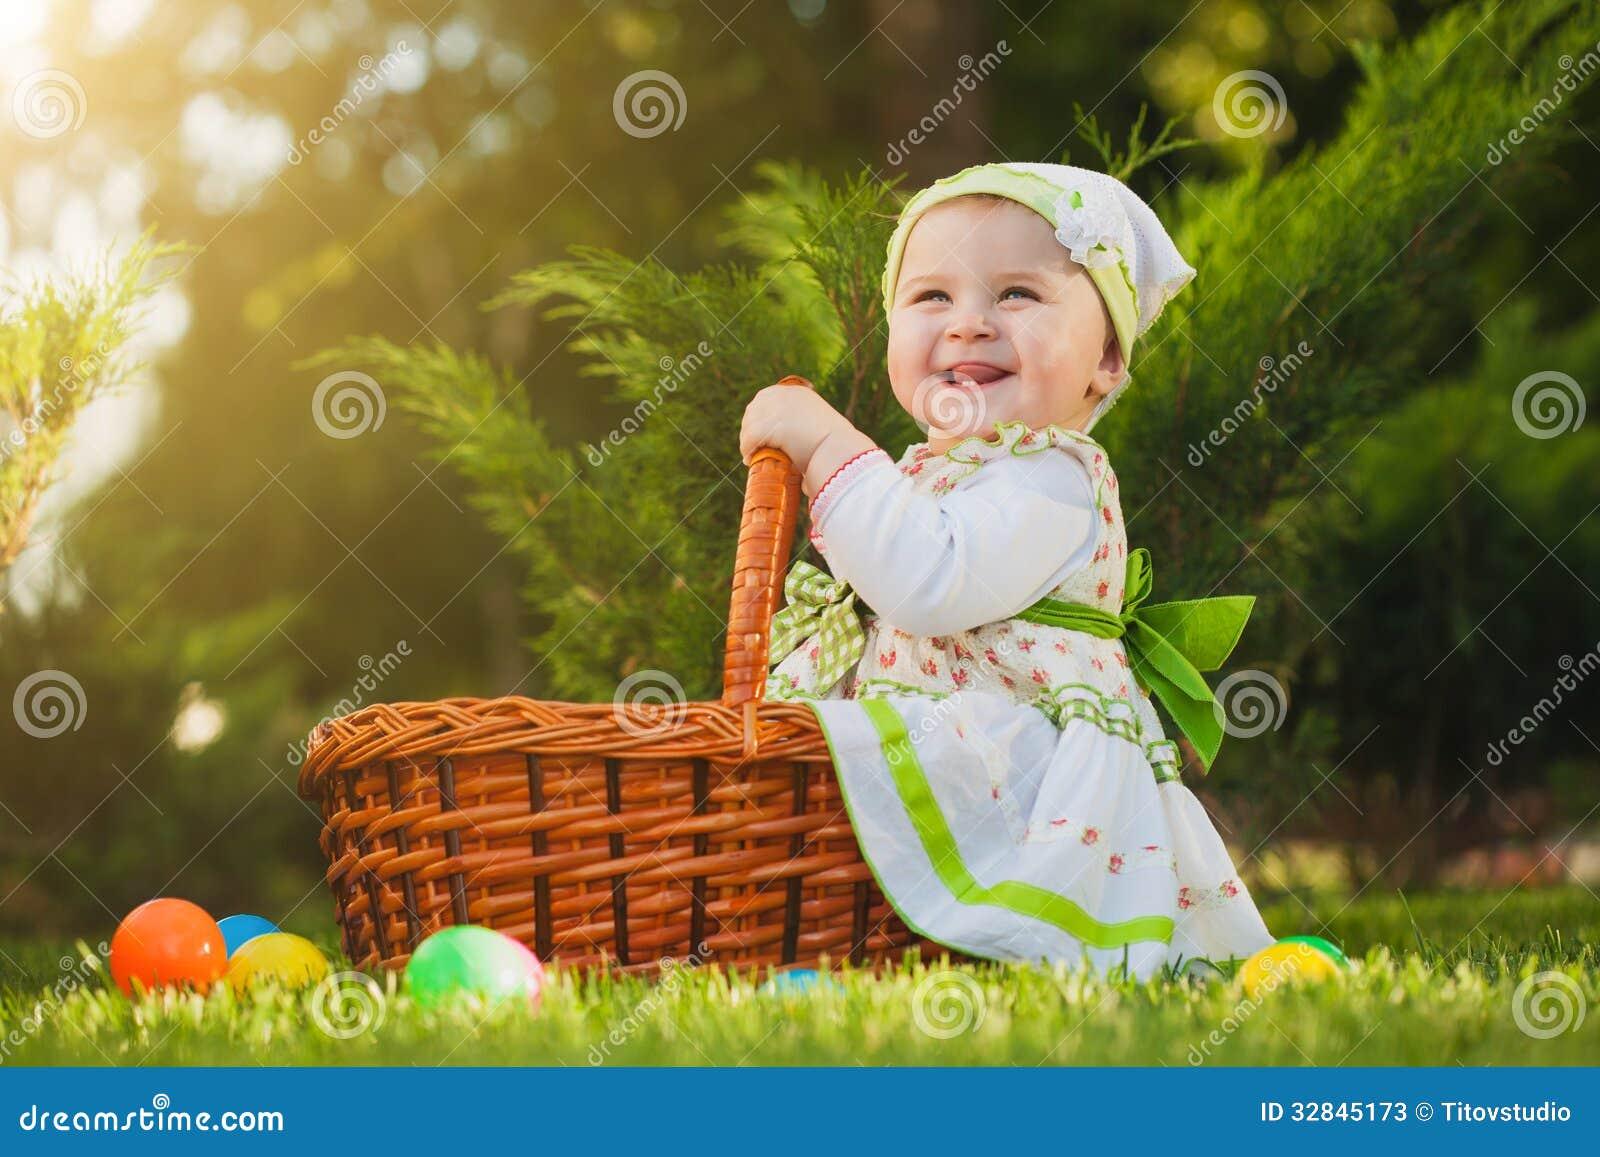 Baby im Korb im grünen Park